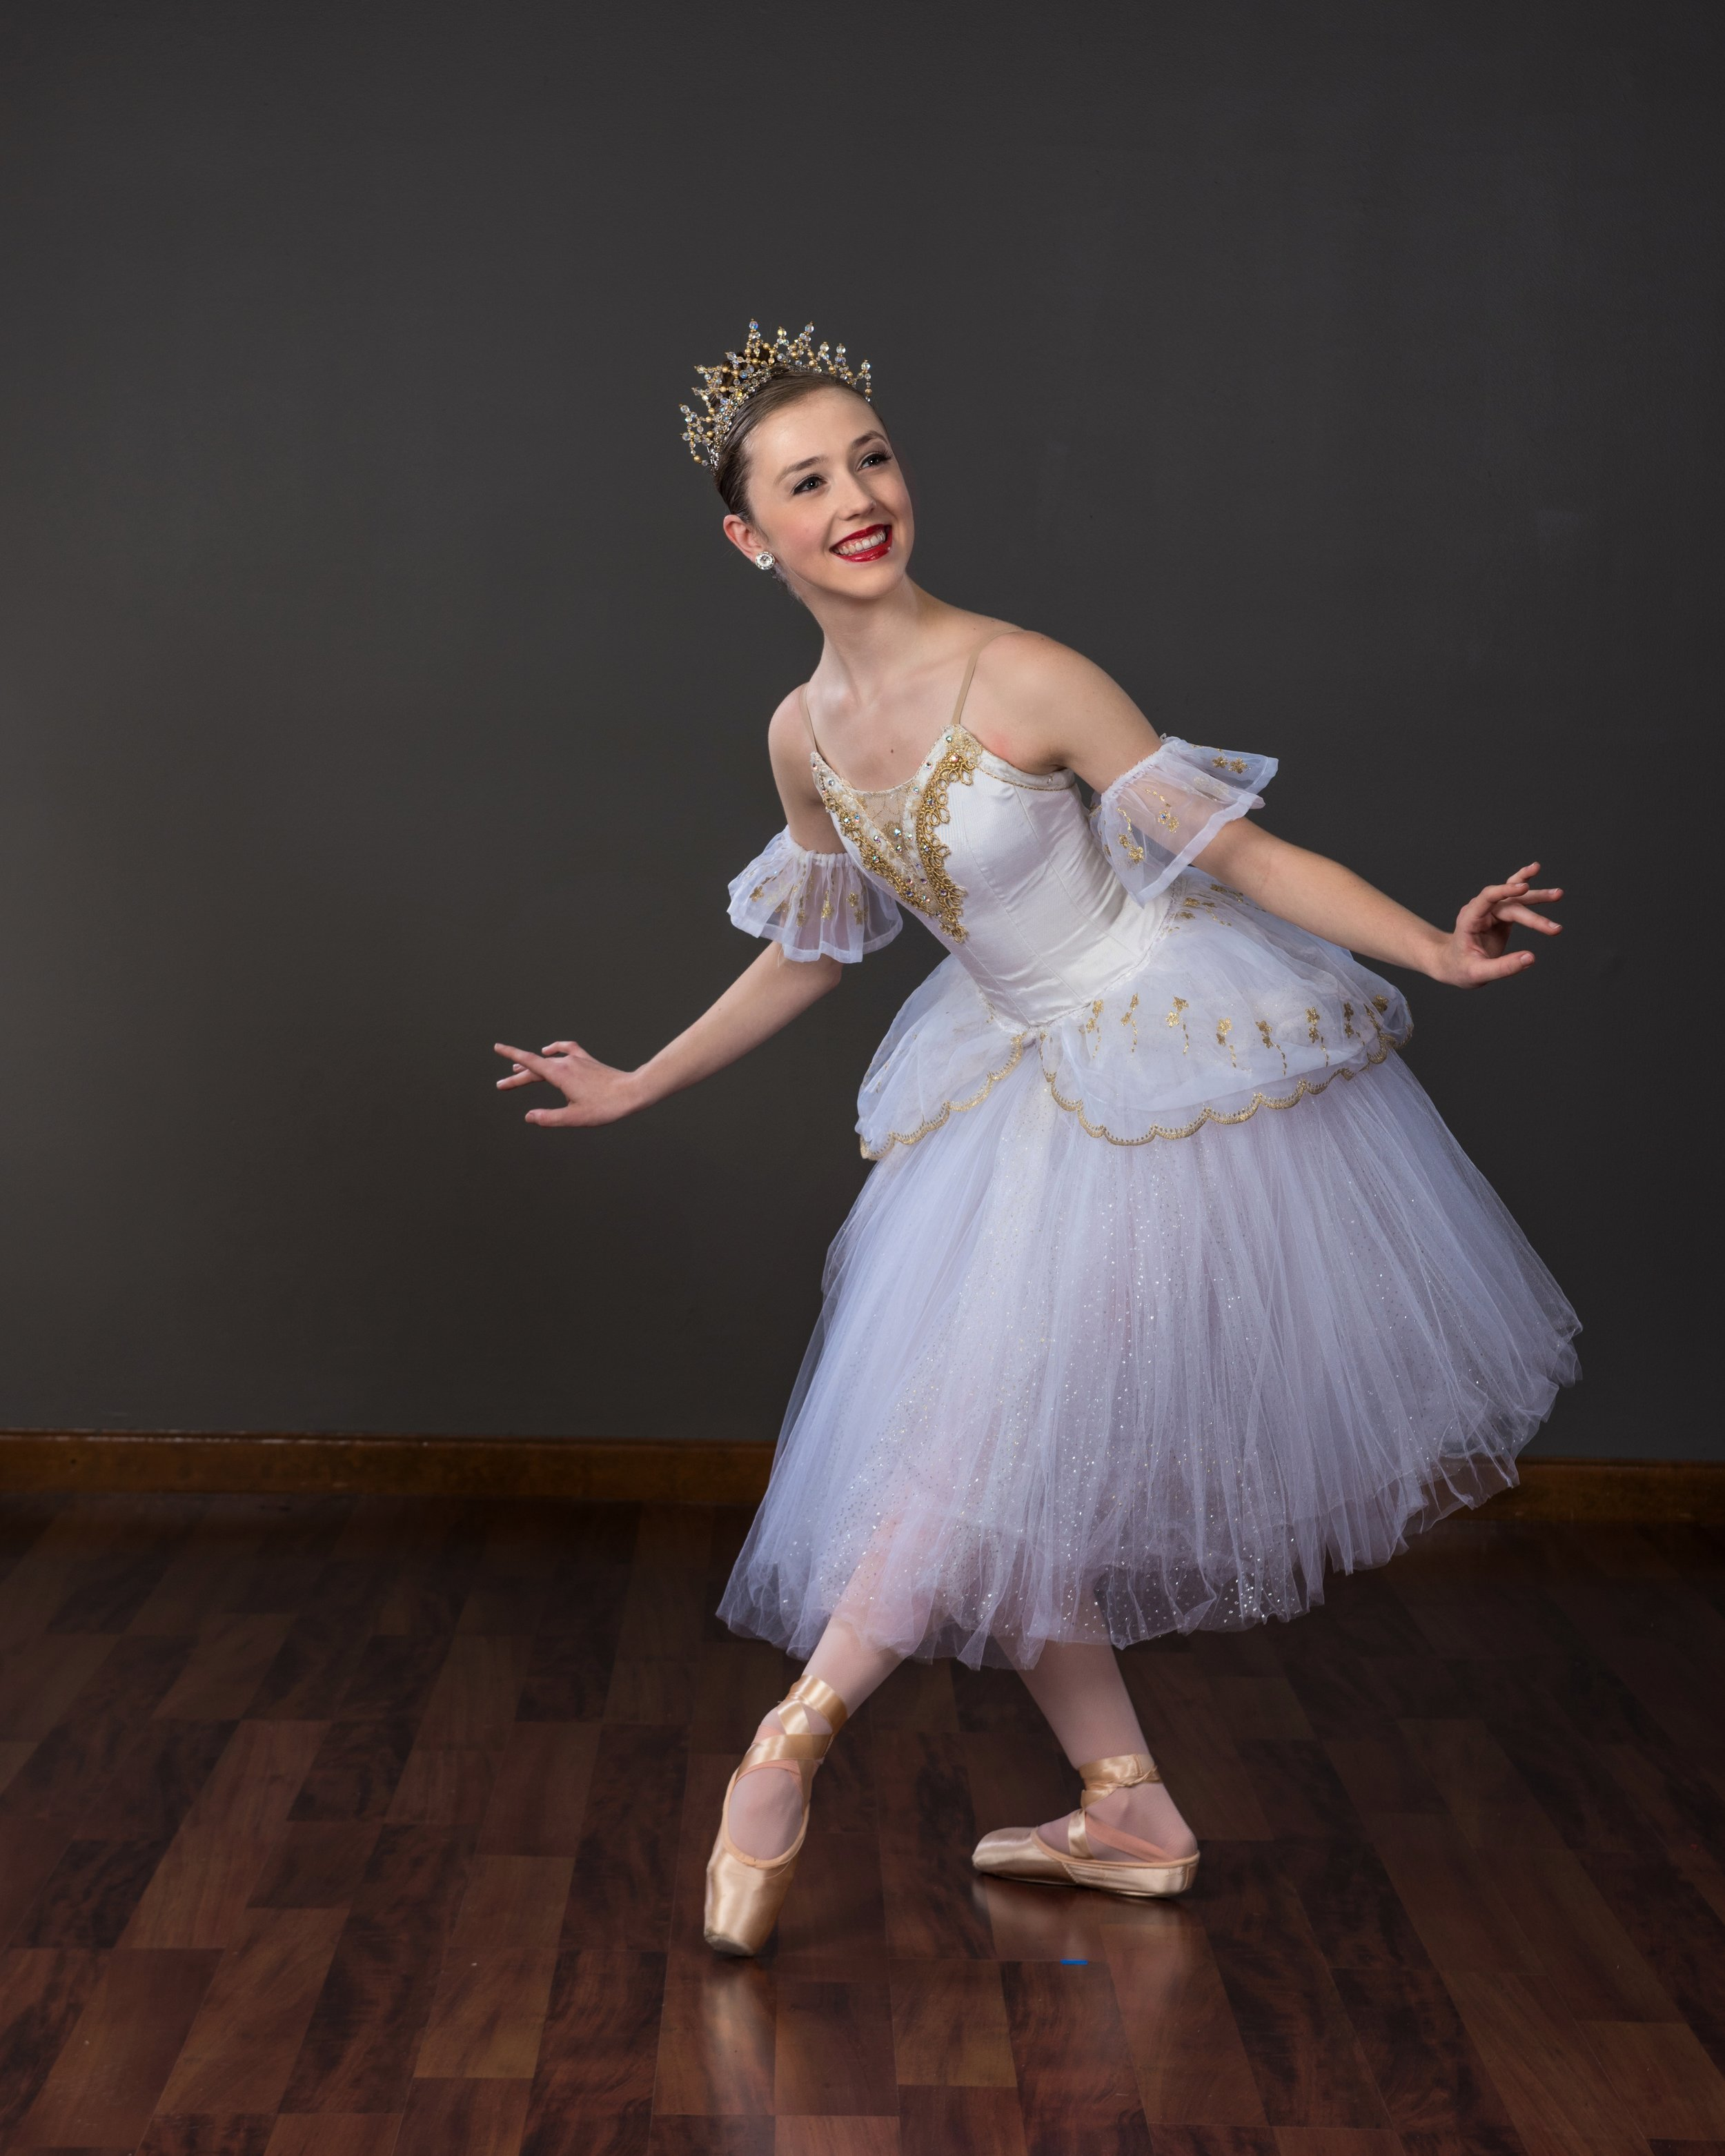 2018 Cinderella-2114_pp.jpeg